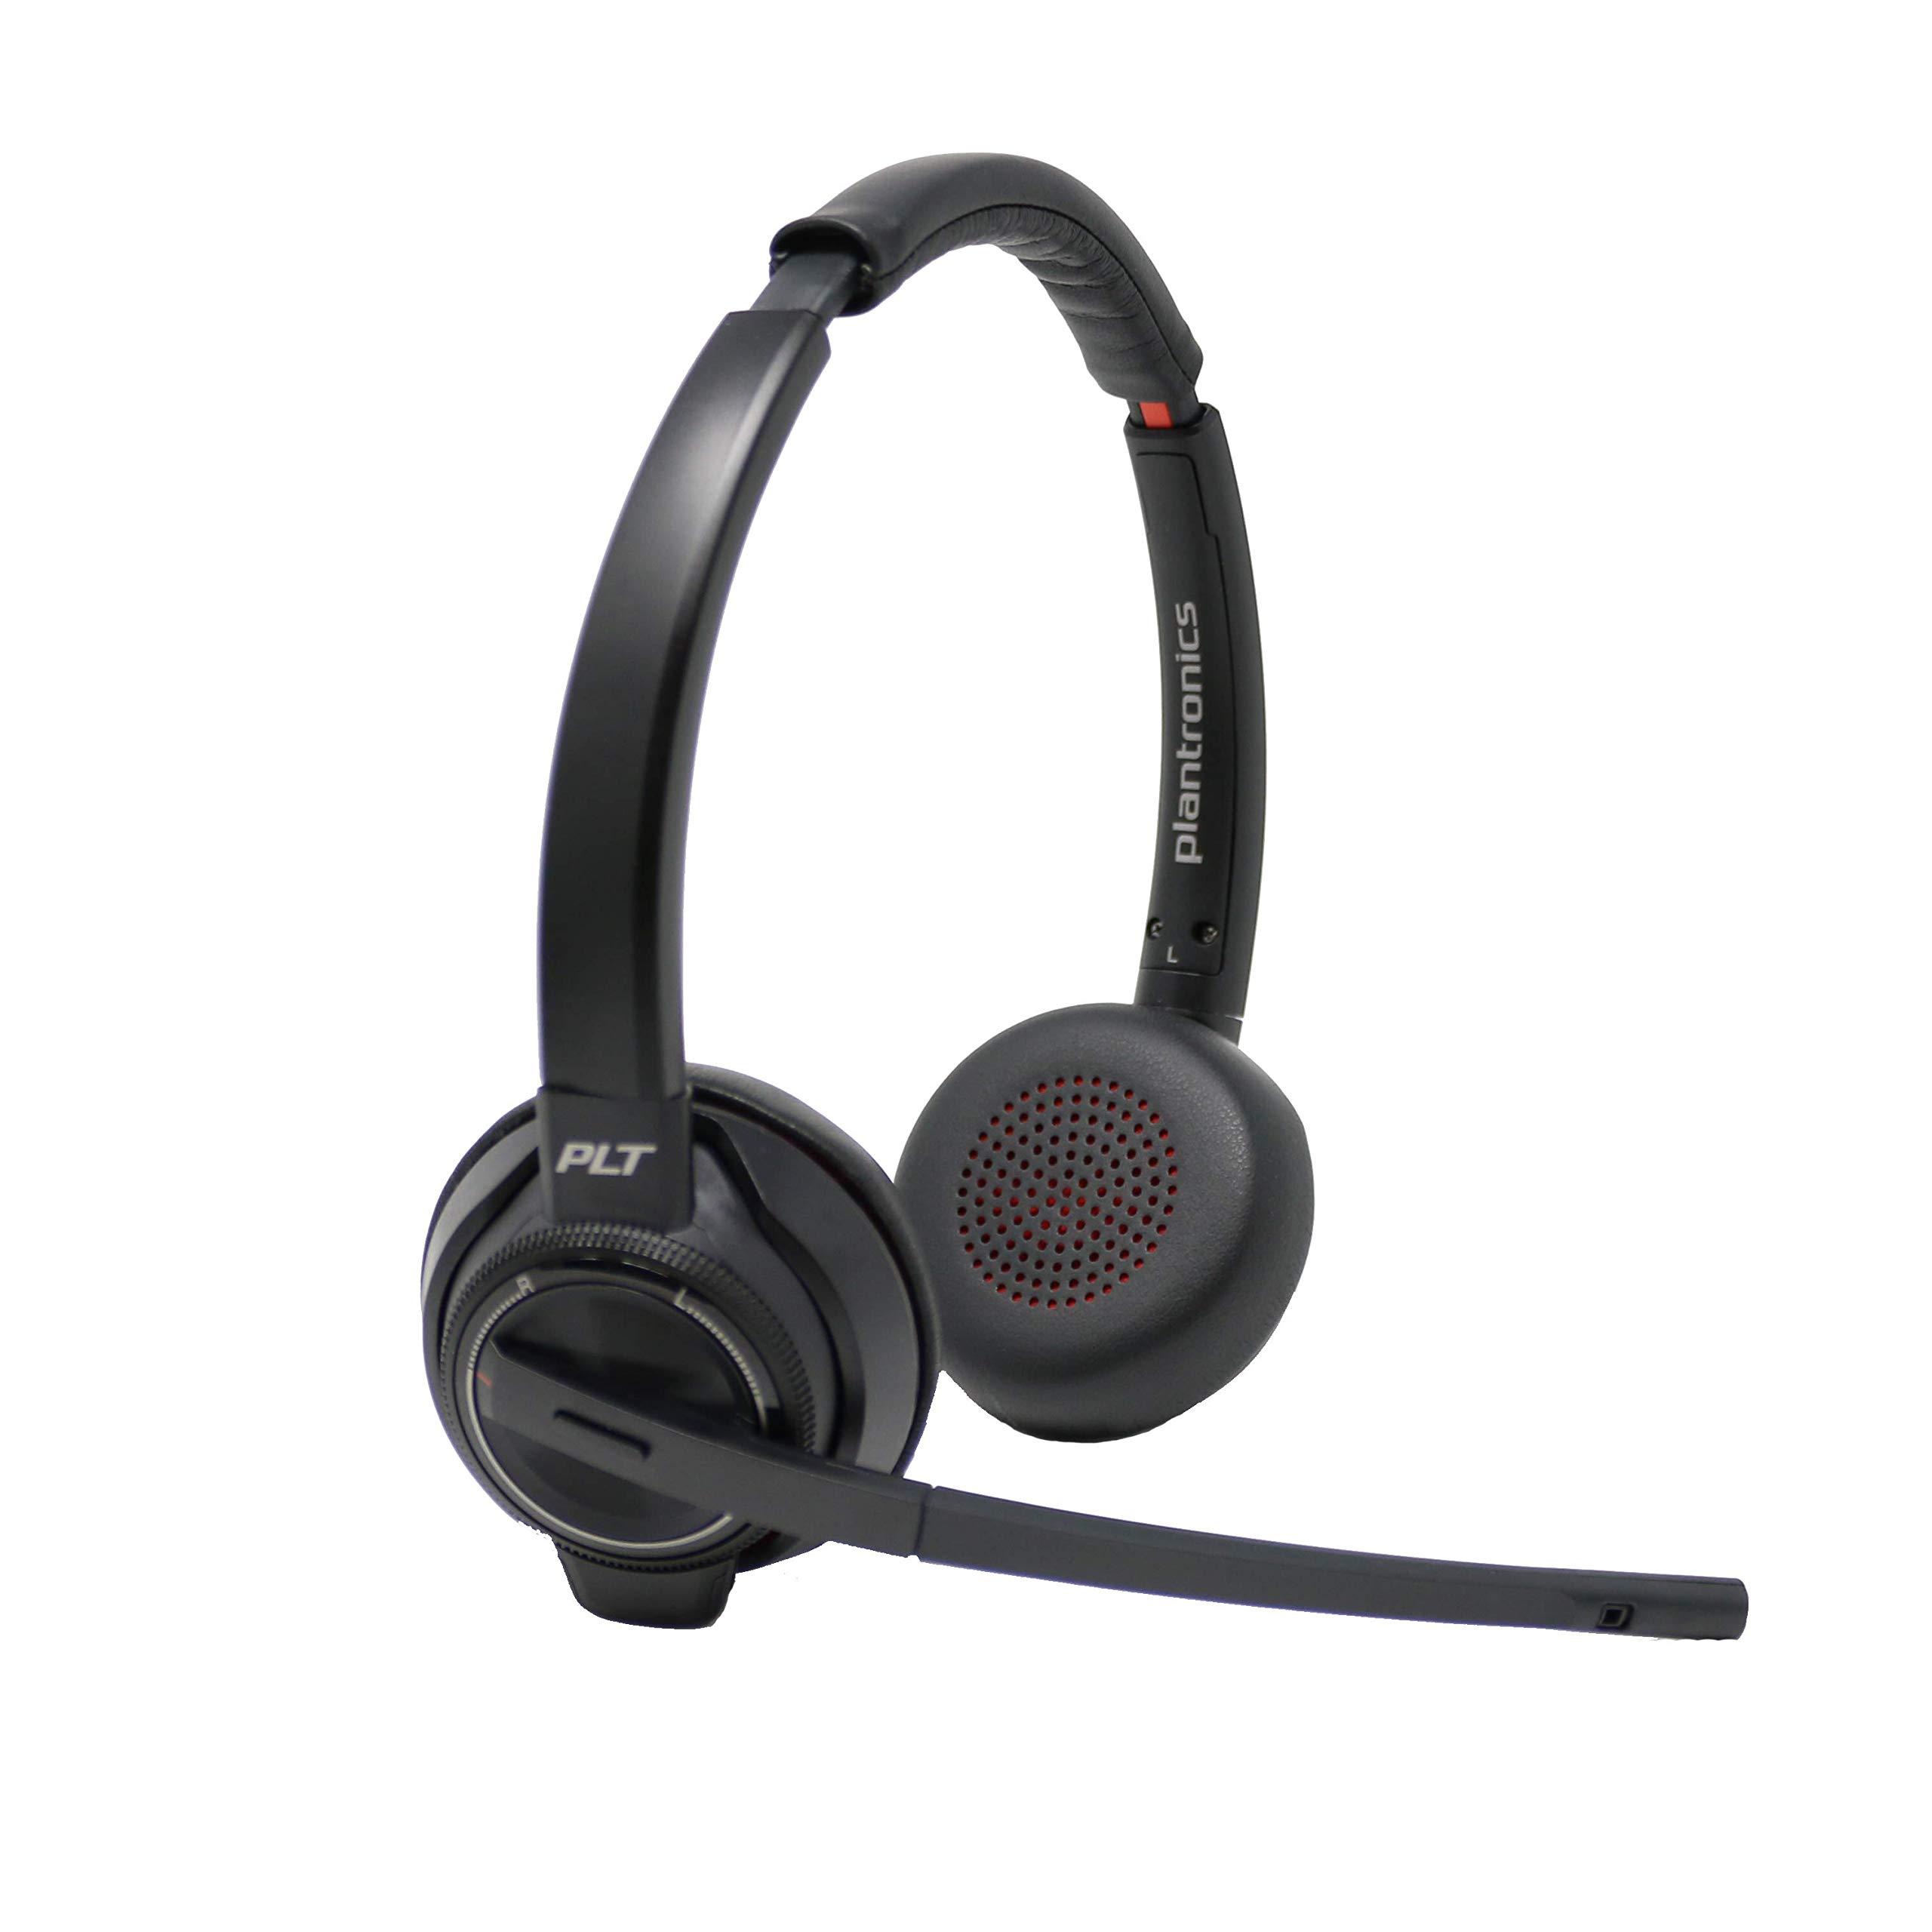 Plantronics Savi 8220 Wireless Headset System Bundle with Headset Advisor Wipe by Plantronics (Image #3)